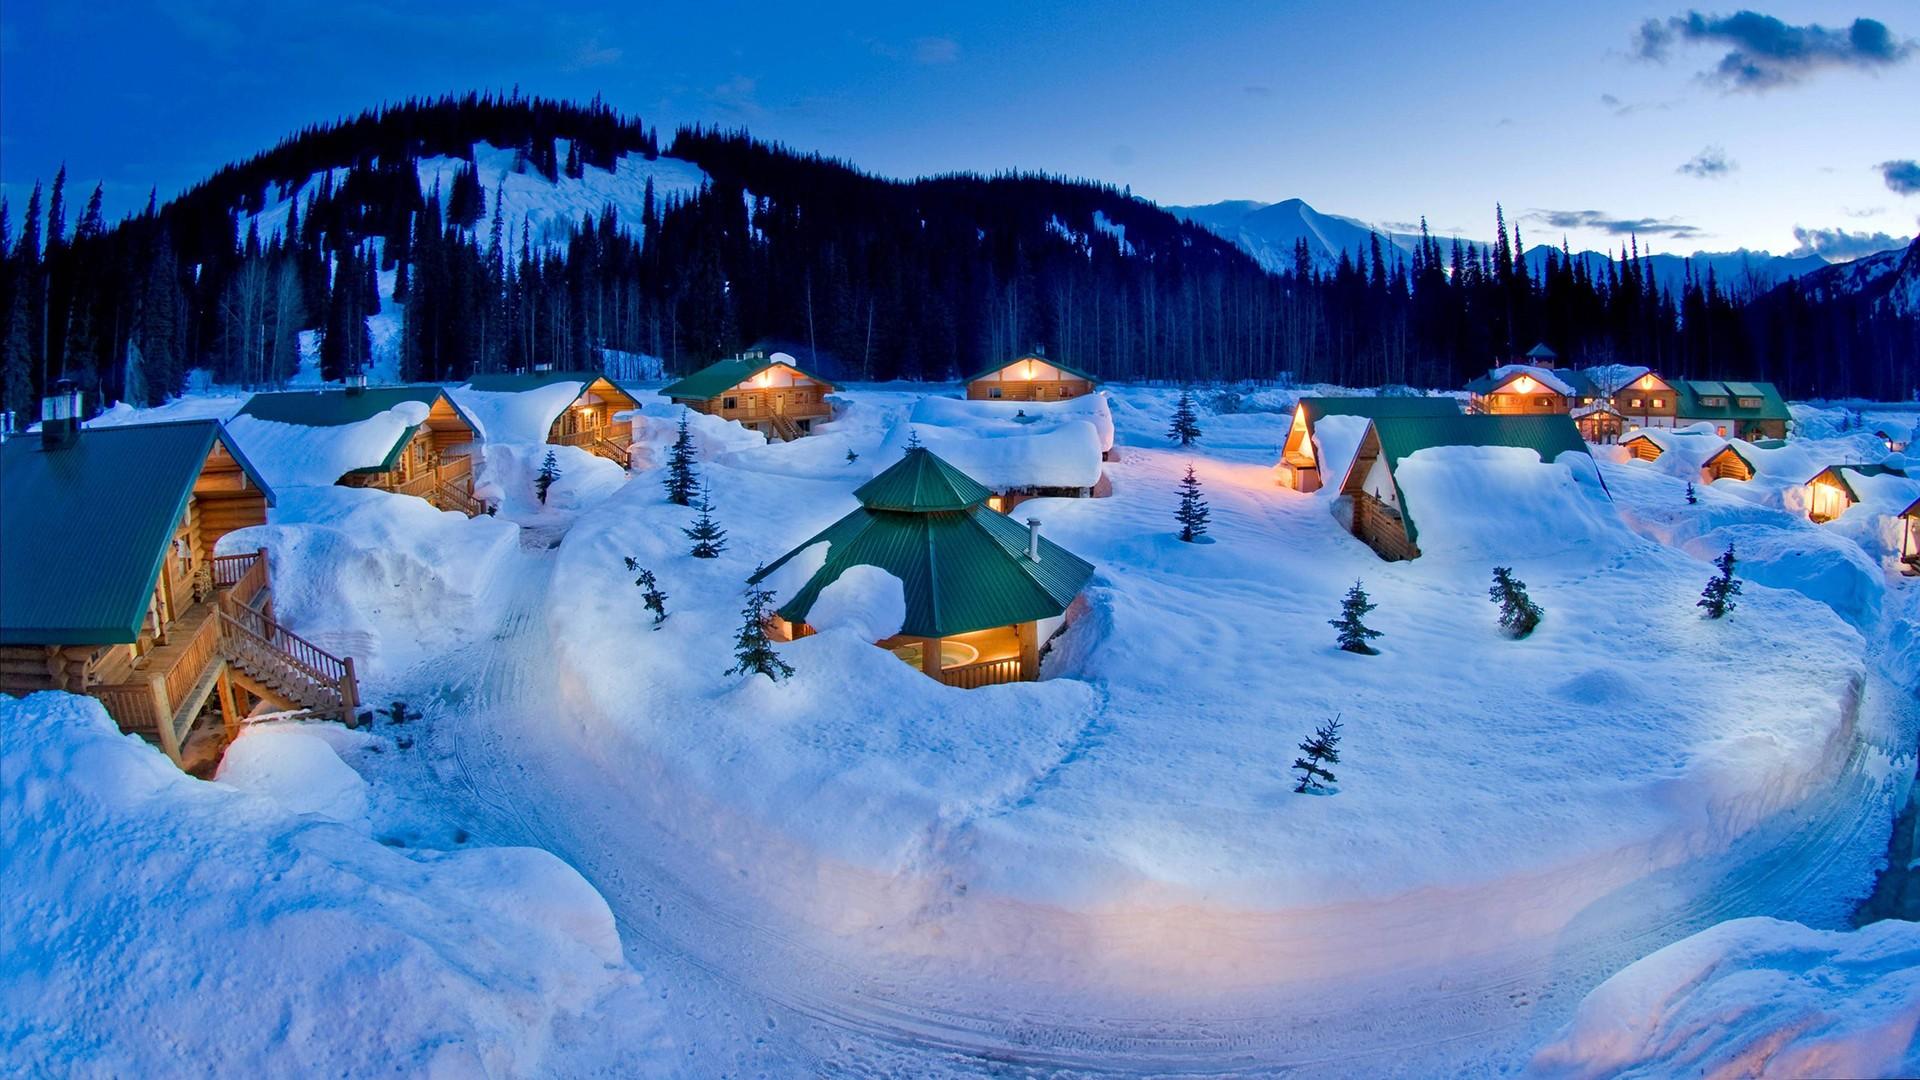 Snow Winter Cabin House Trees wallpaper 1920x1080 136944 1920x1080